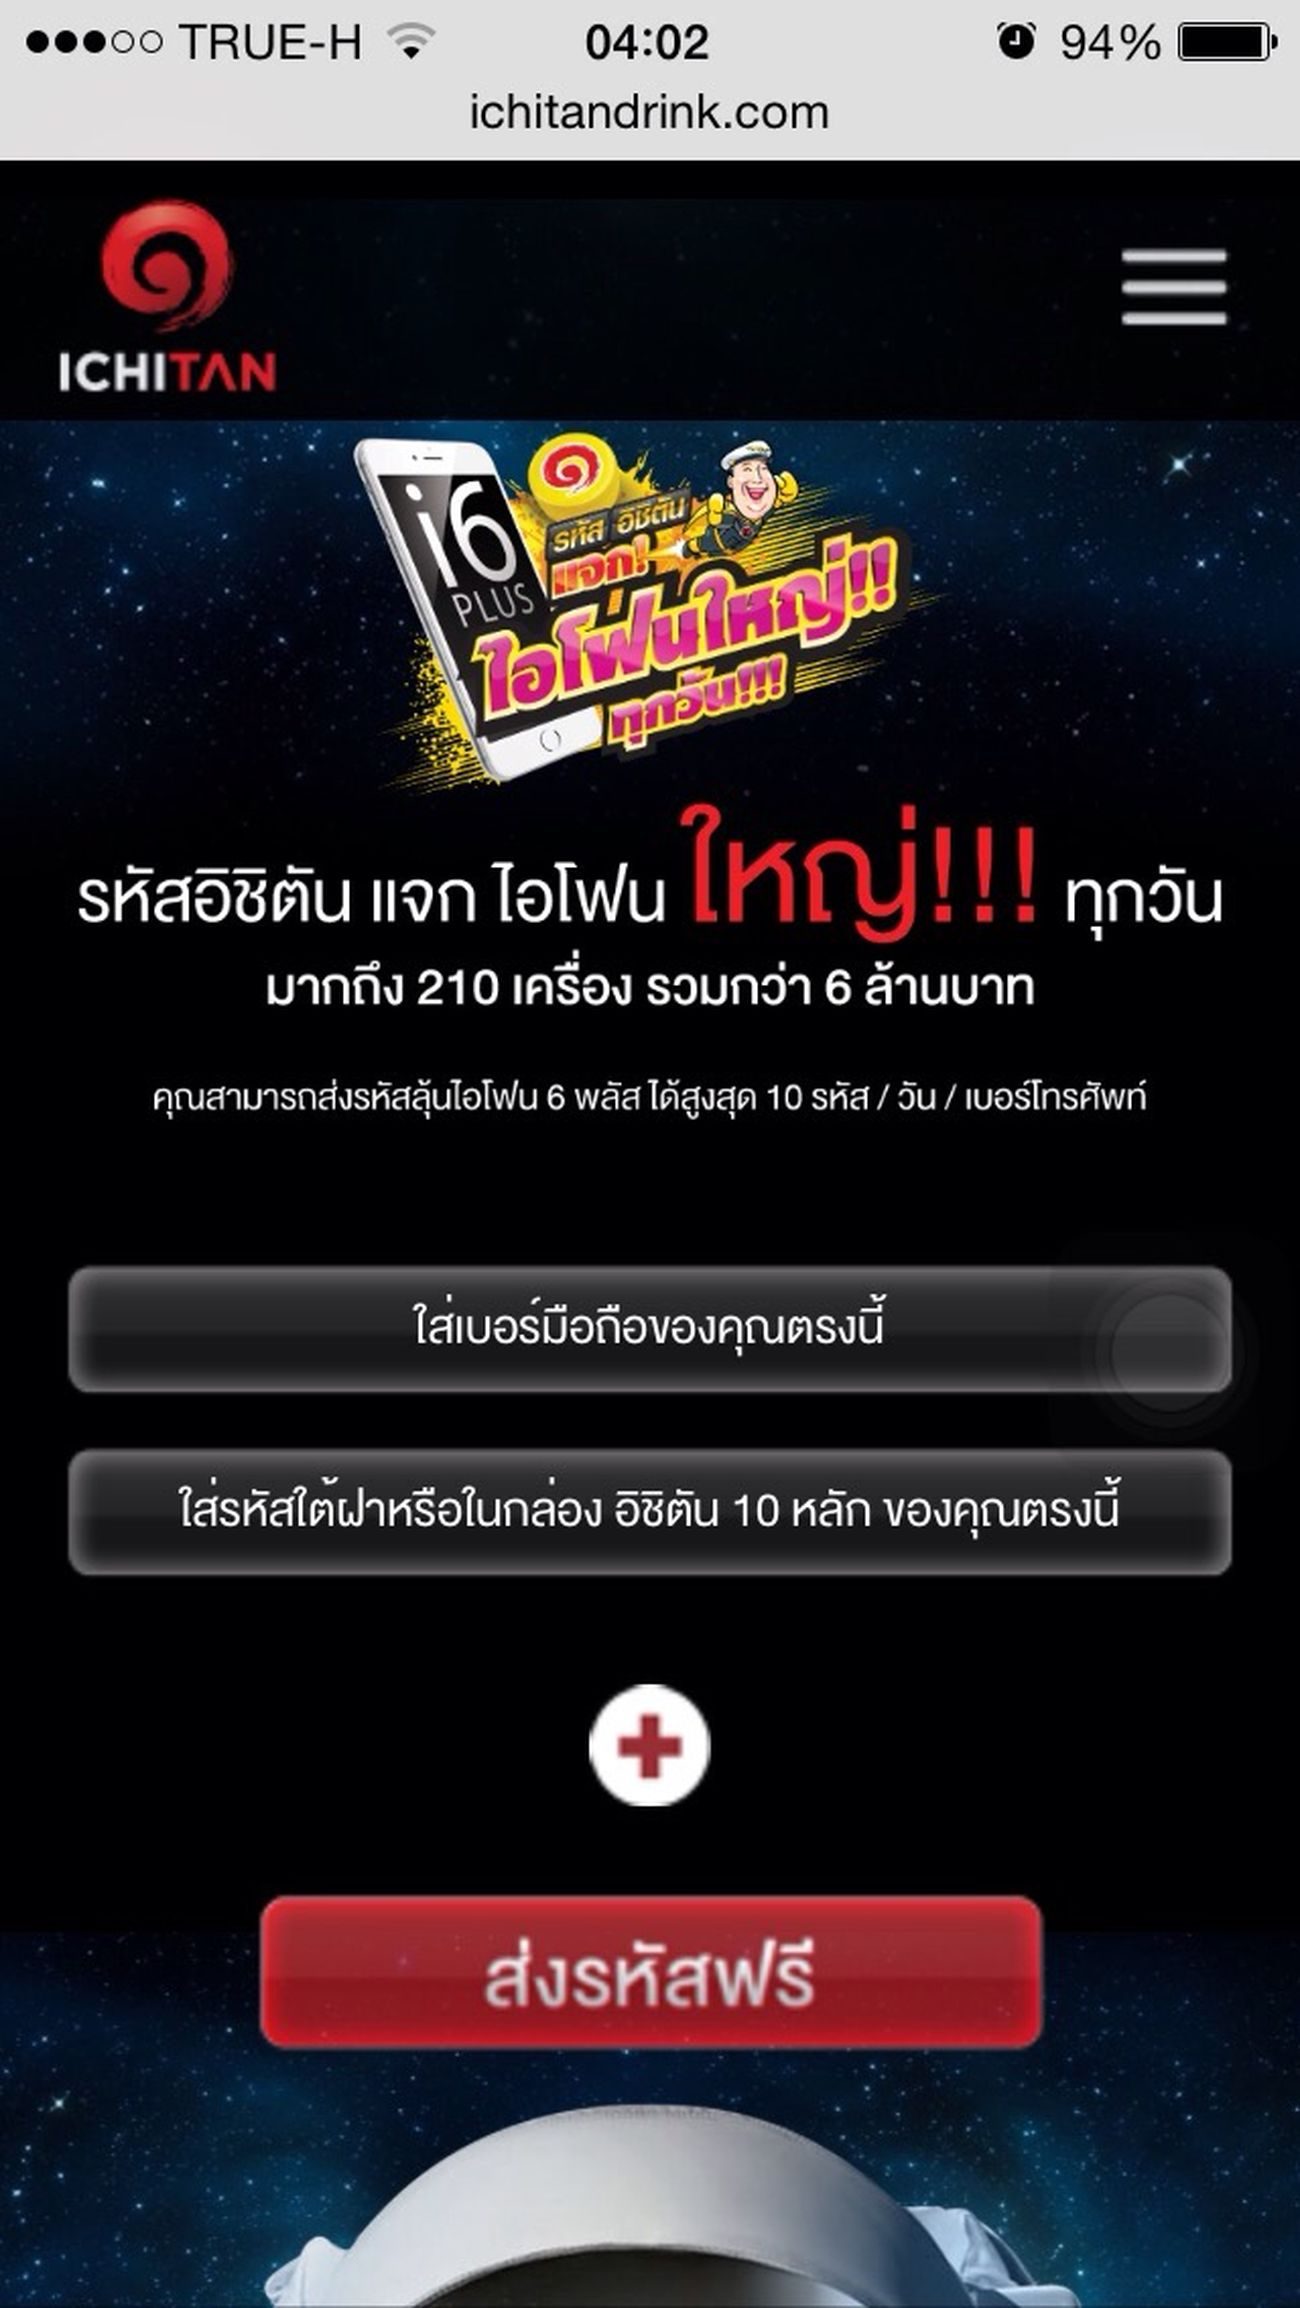 Ichitan ใจดีแจกฟรีไอโฟน6+ 128g